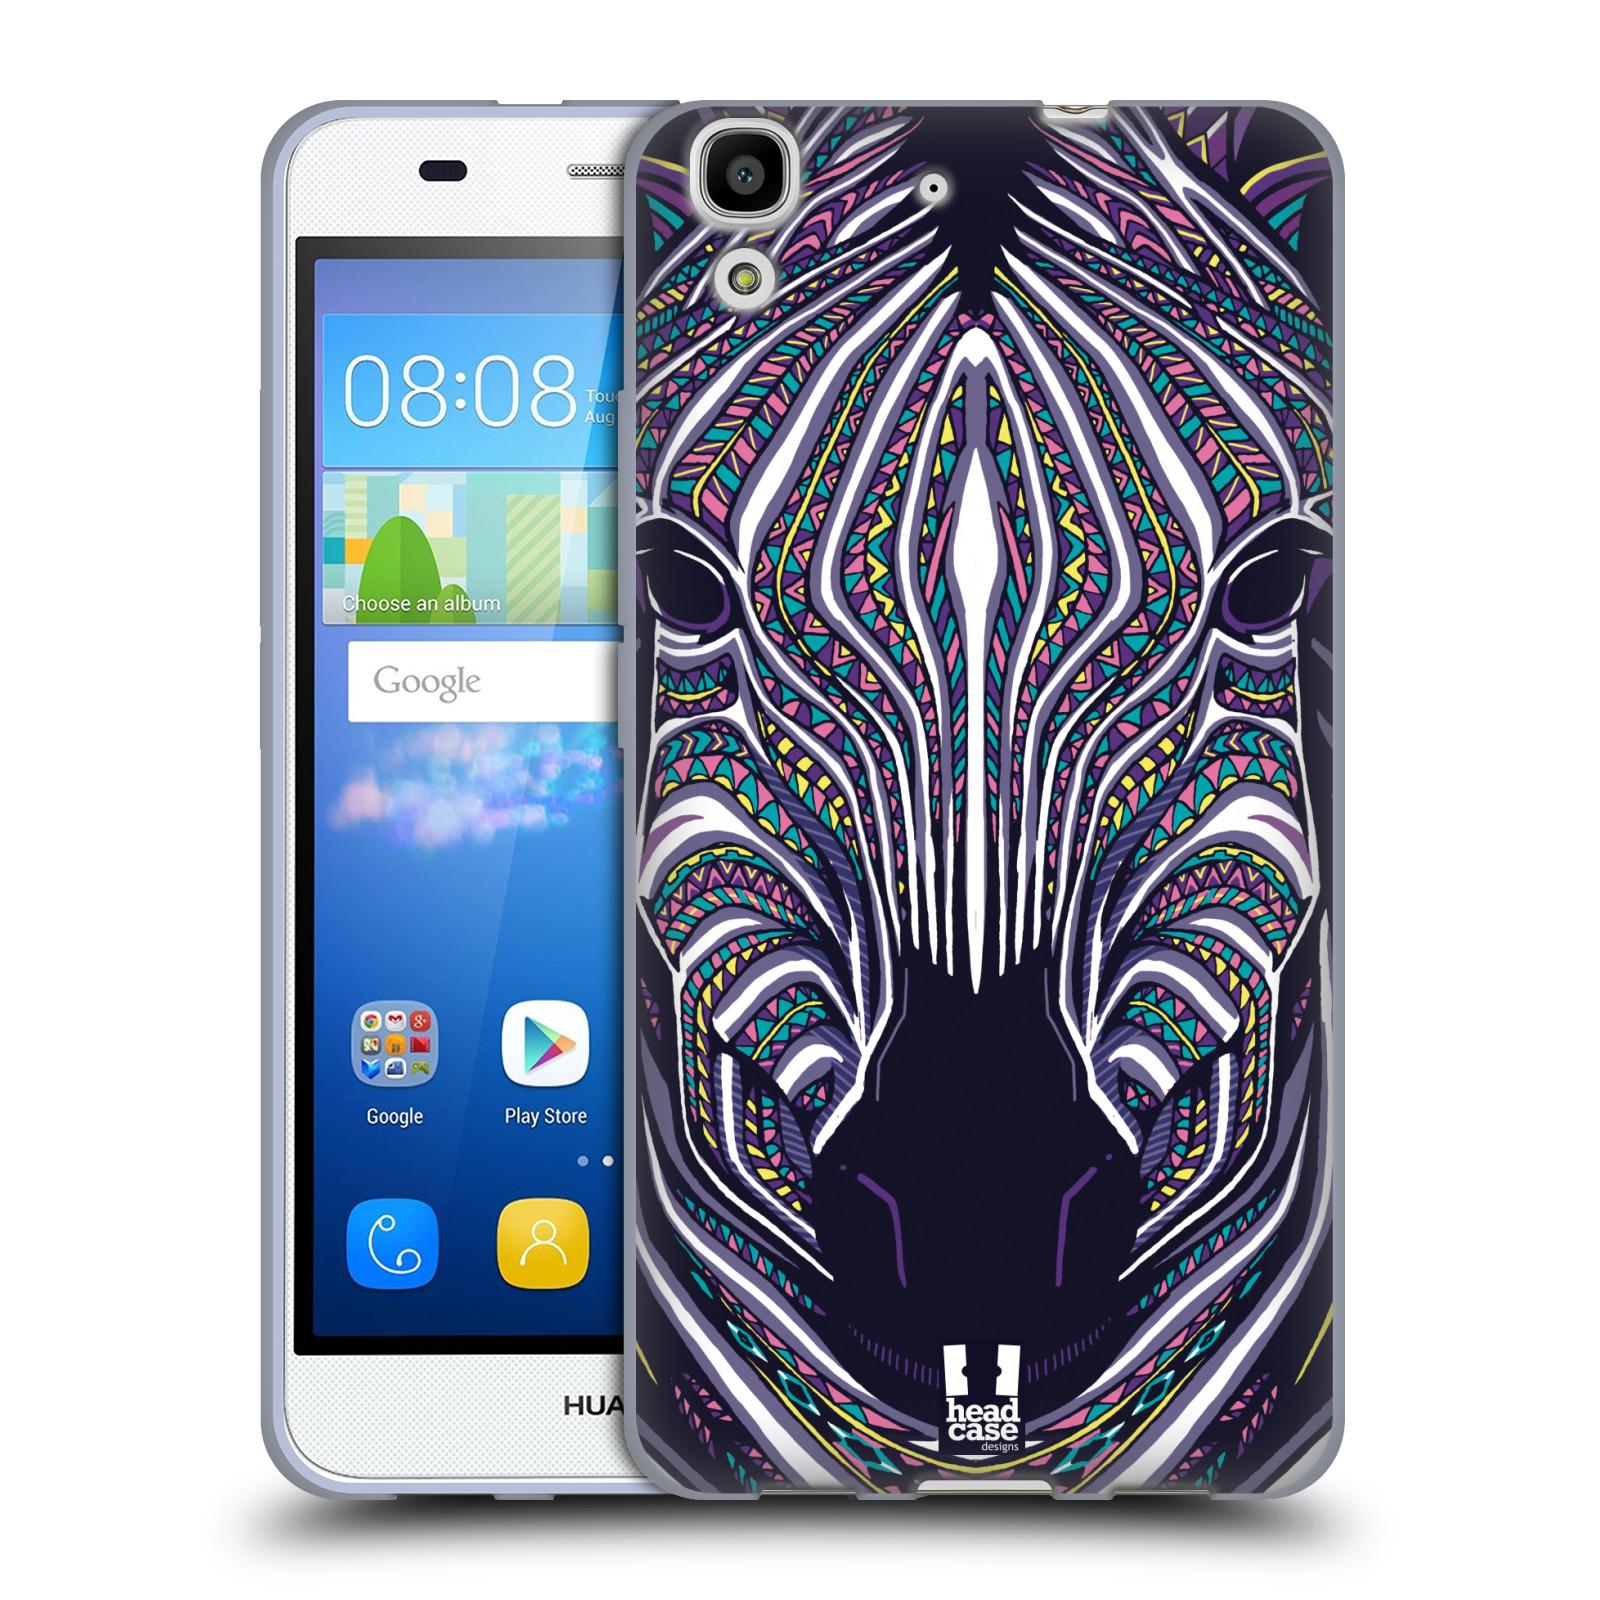 Silikonové pouzdro na mobil Huawei Y6 HEAD CASE AZTEC ZEBRA